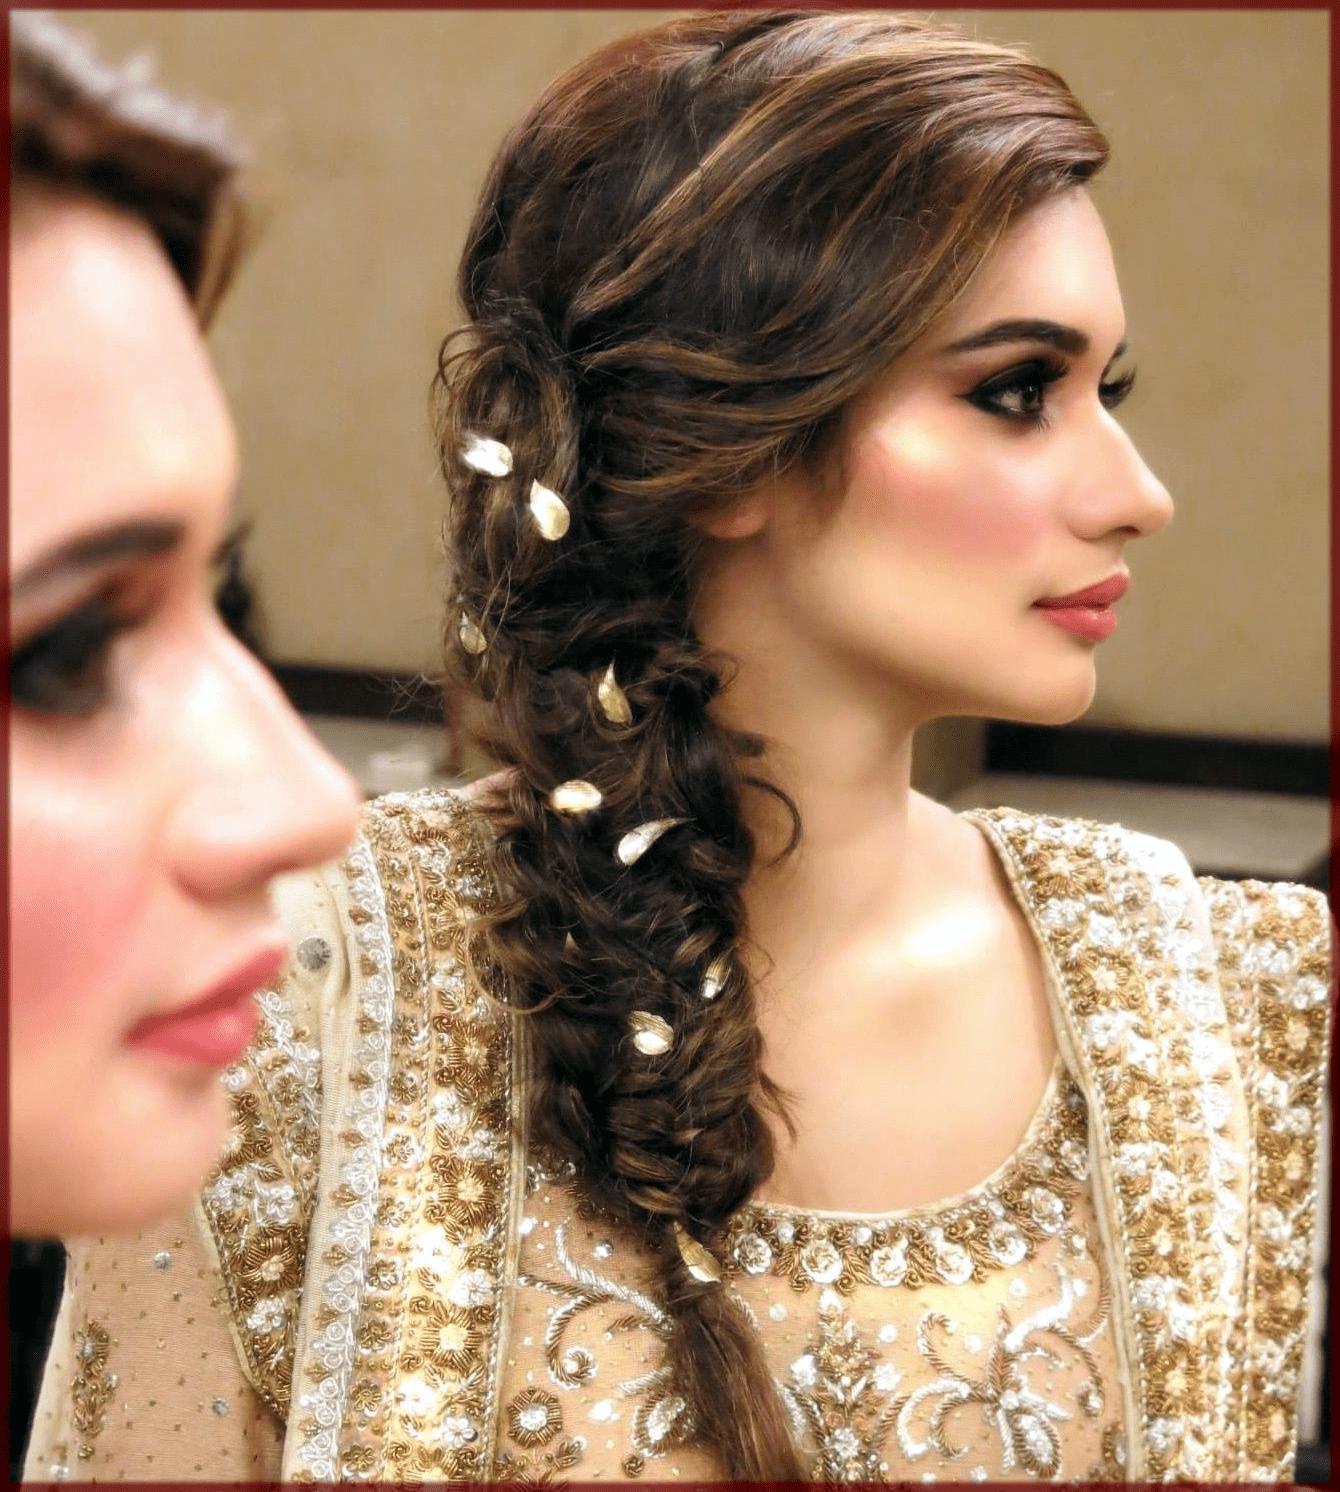 Latest Pakistani Bridal Hairstyles 2020 for Mehndi, Barat and Walima